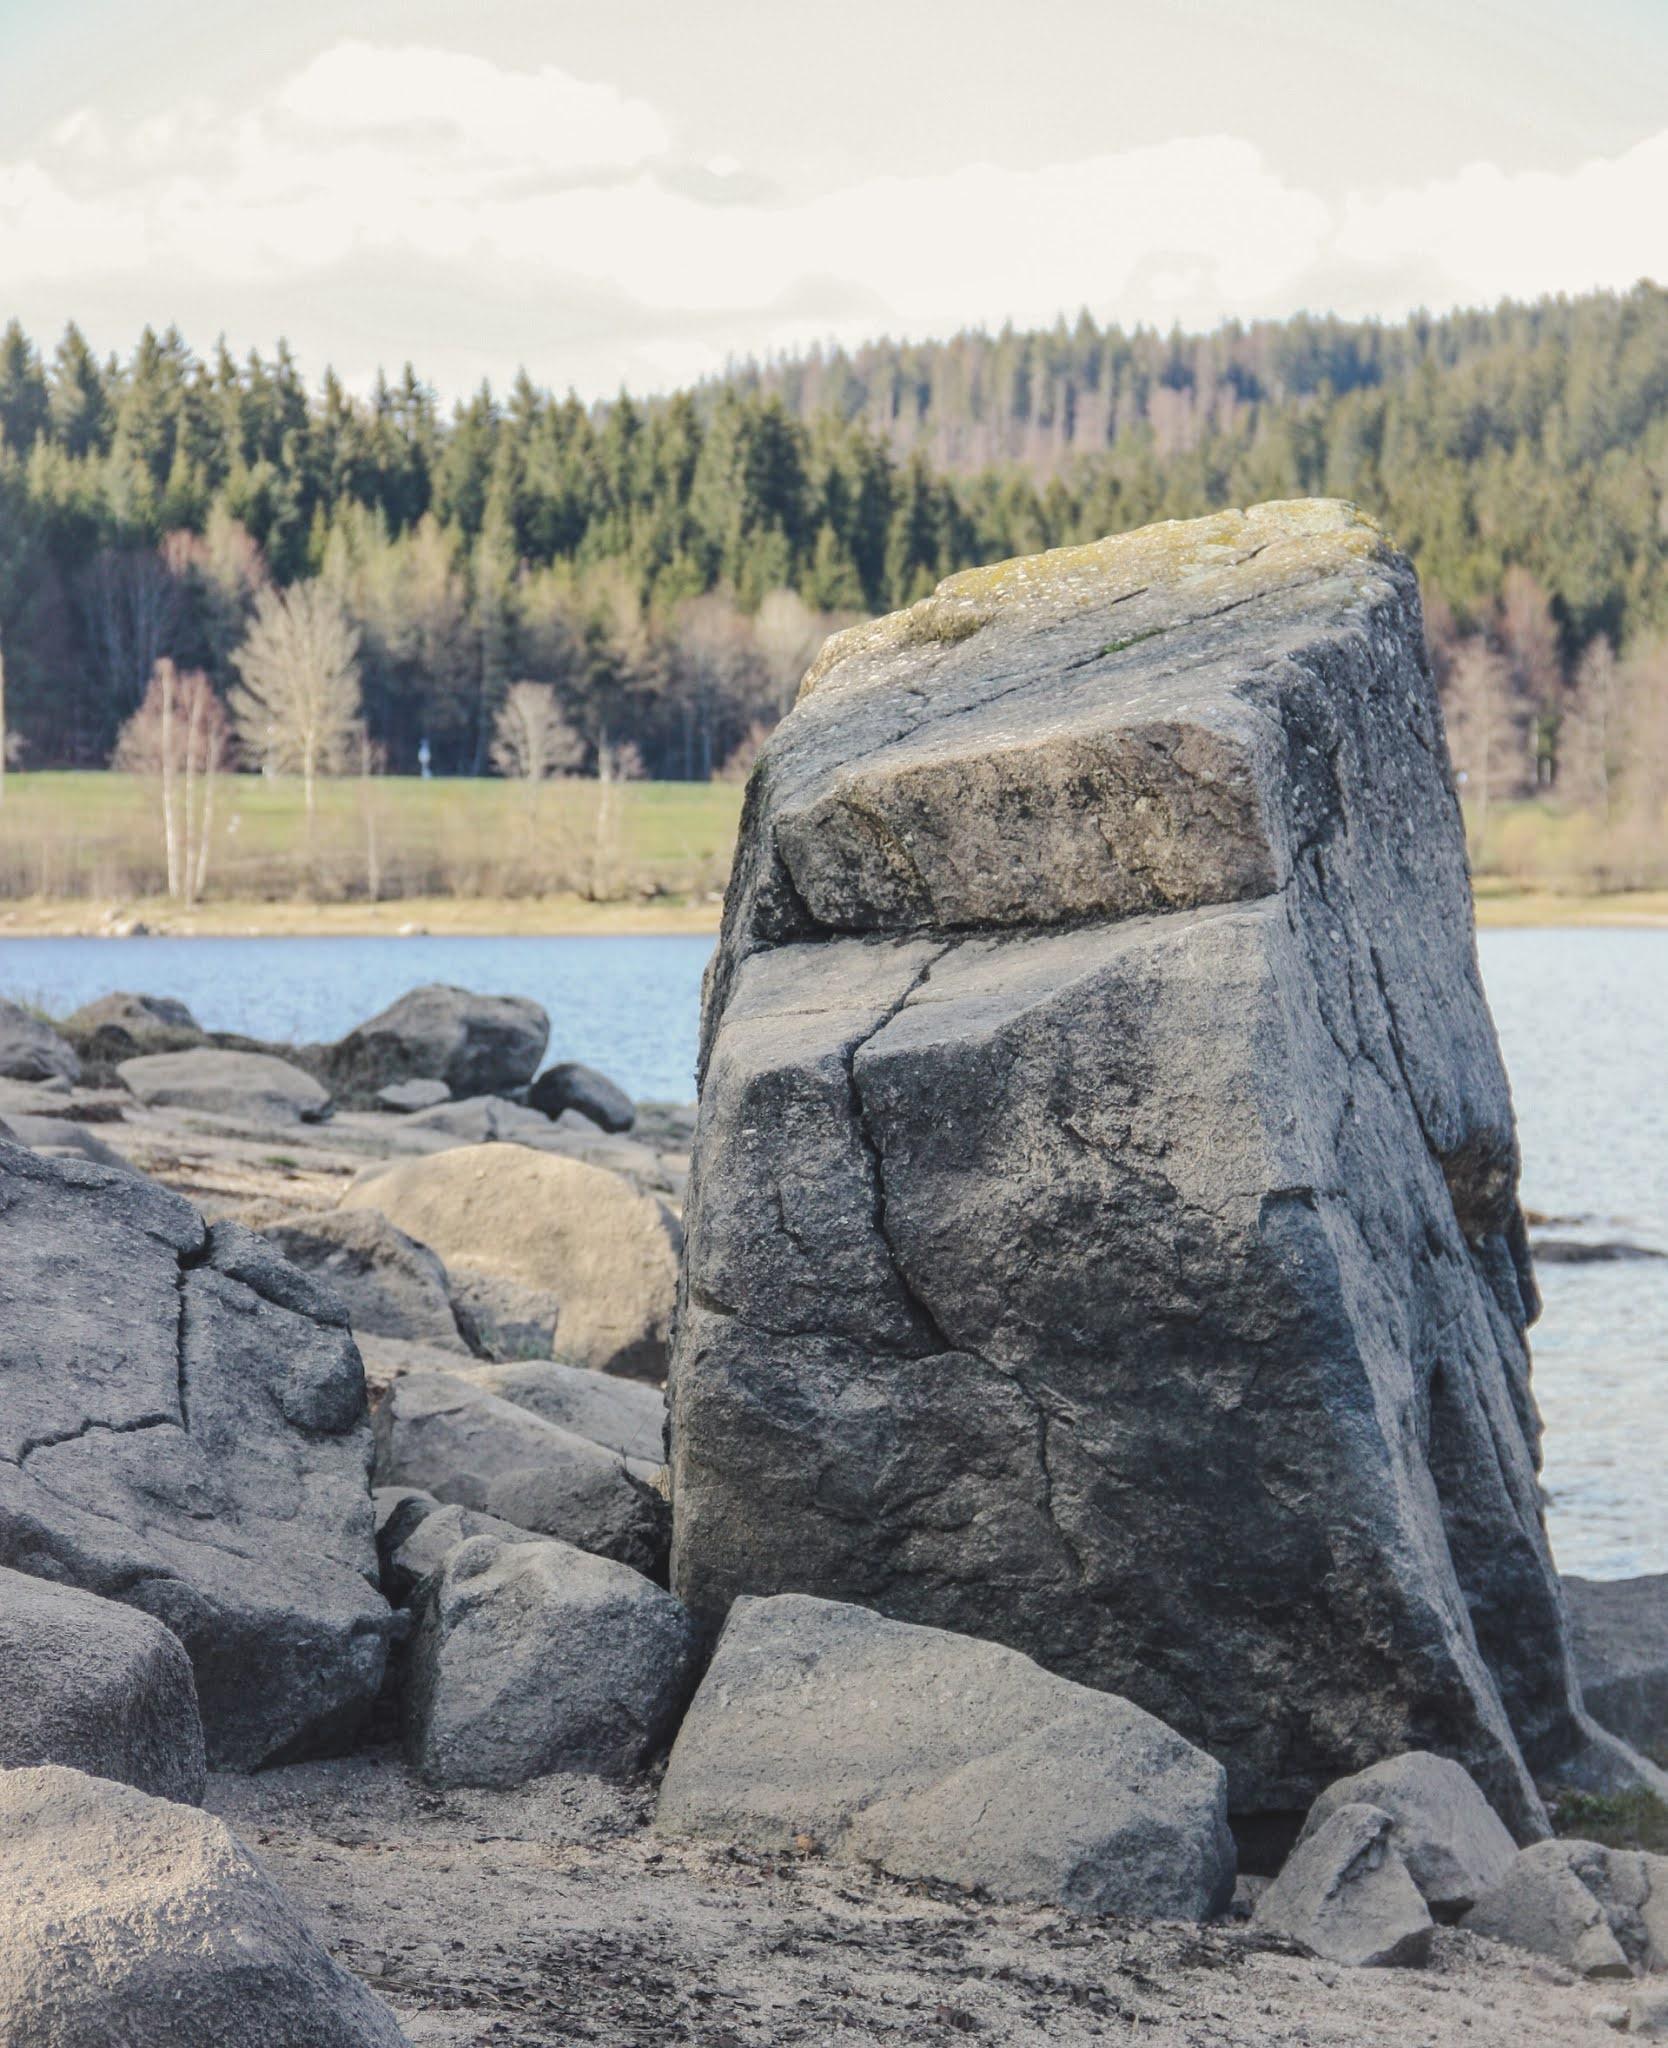 snackenglish, snack, roca, rock, boulder, pedrusco, peñasco, lago